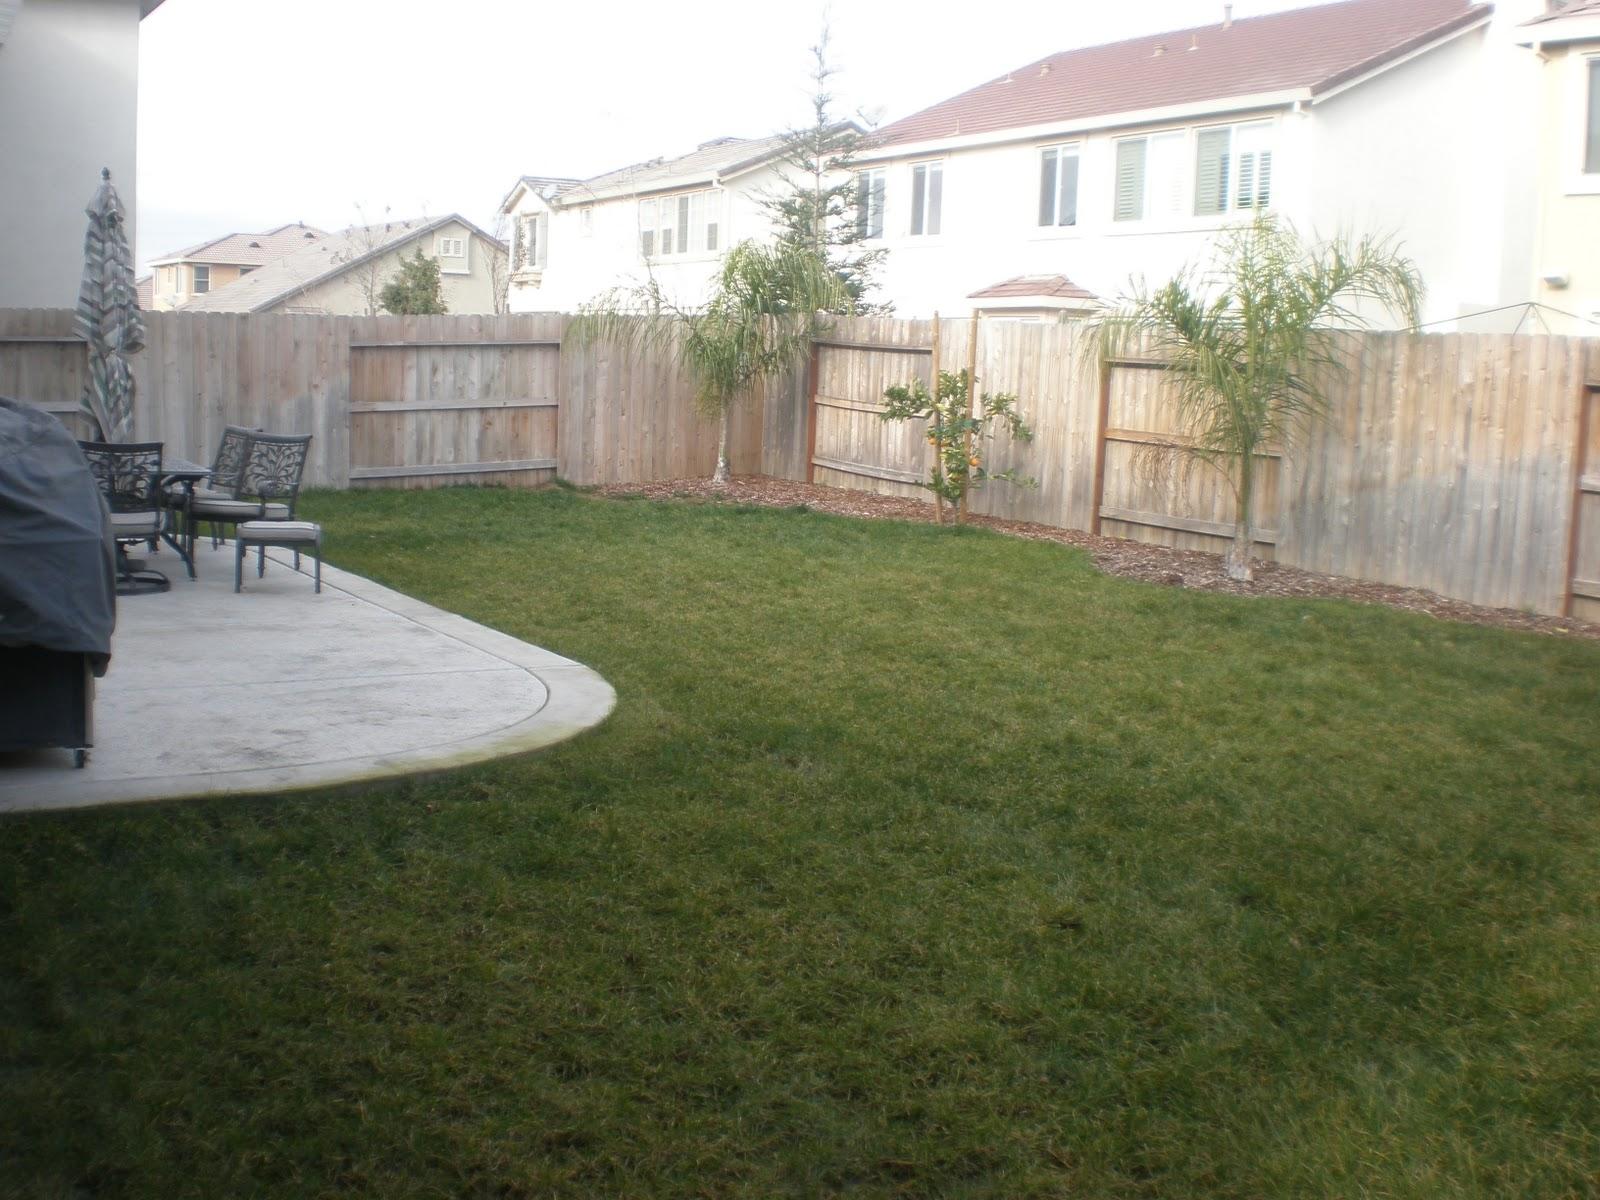 Backyard Pool in Sacramento: Inground Pool Contracting in ...